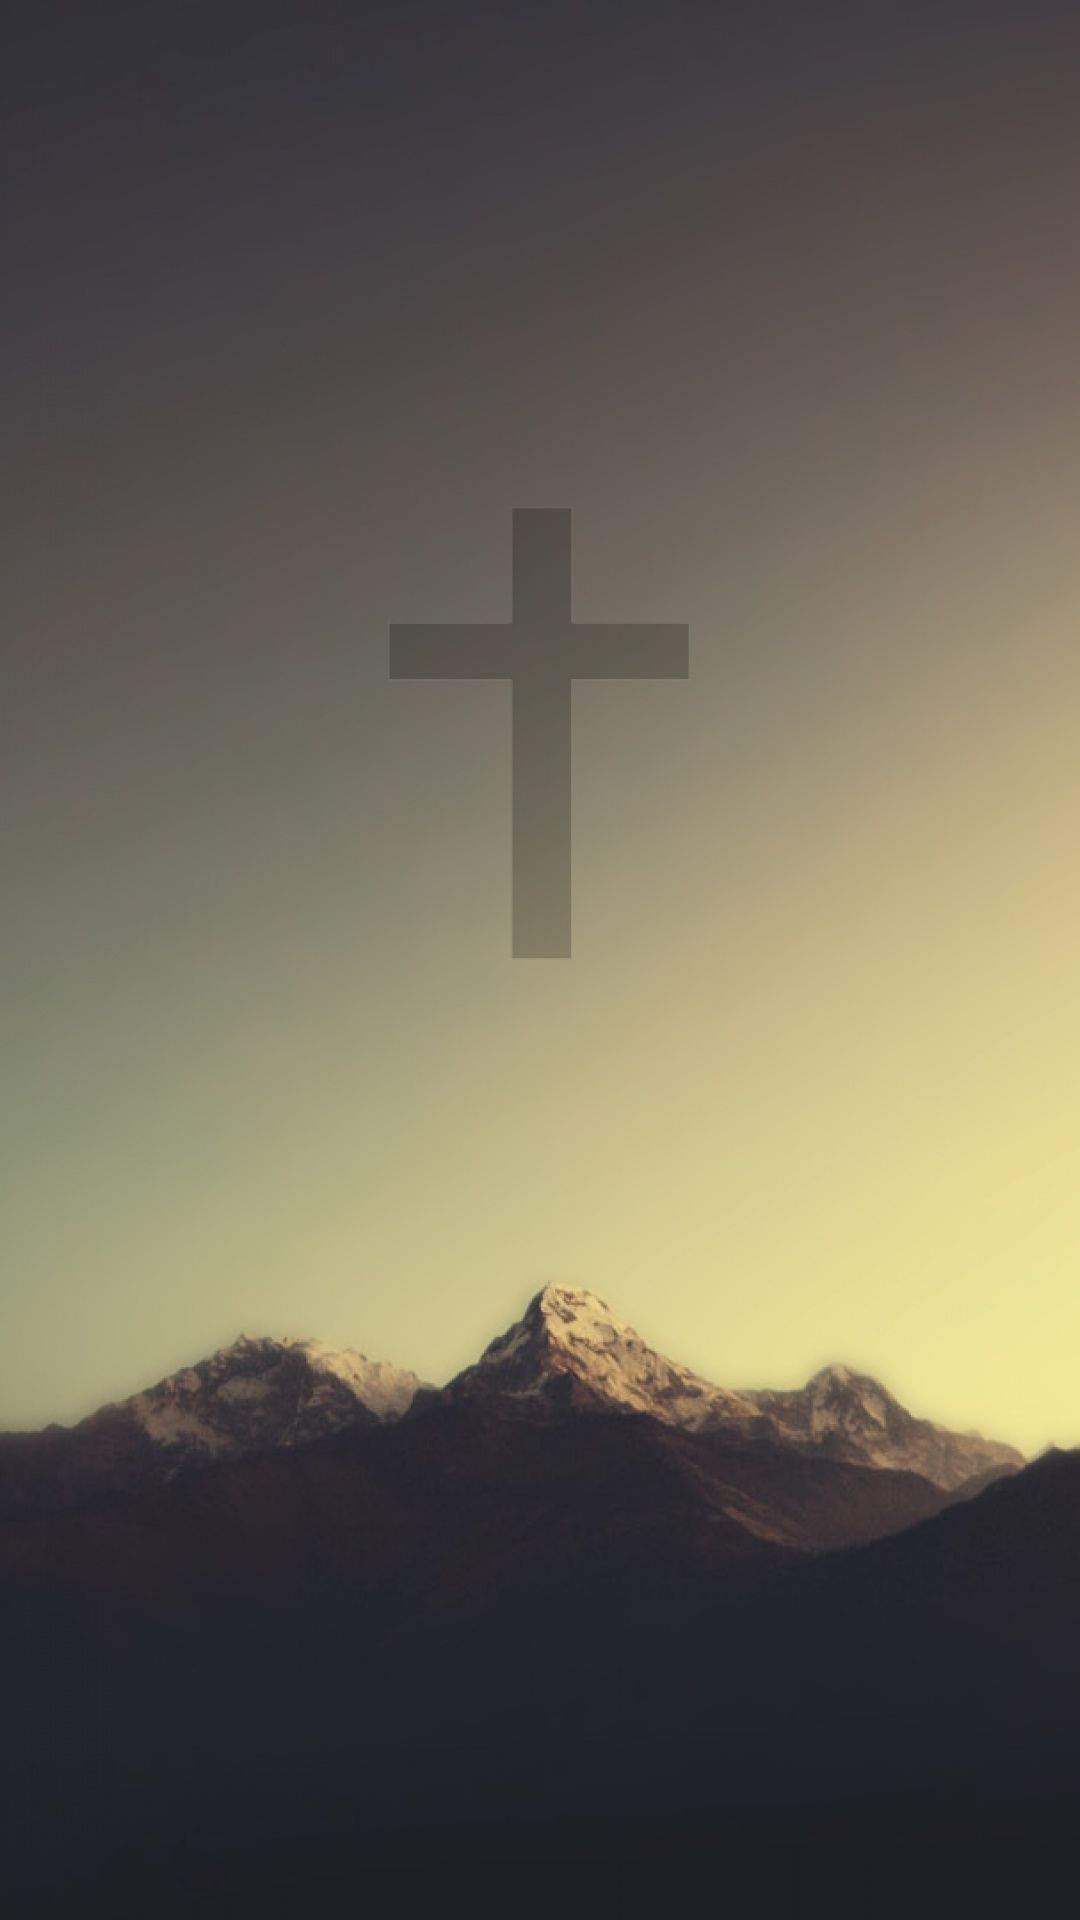 Jesus 4K iPhone Wallpapers , Top Free Jesus 4K iPhone